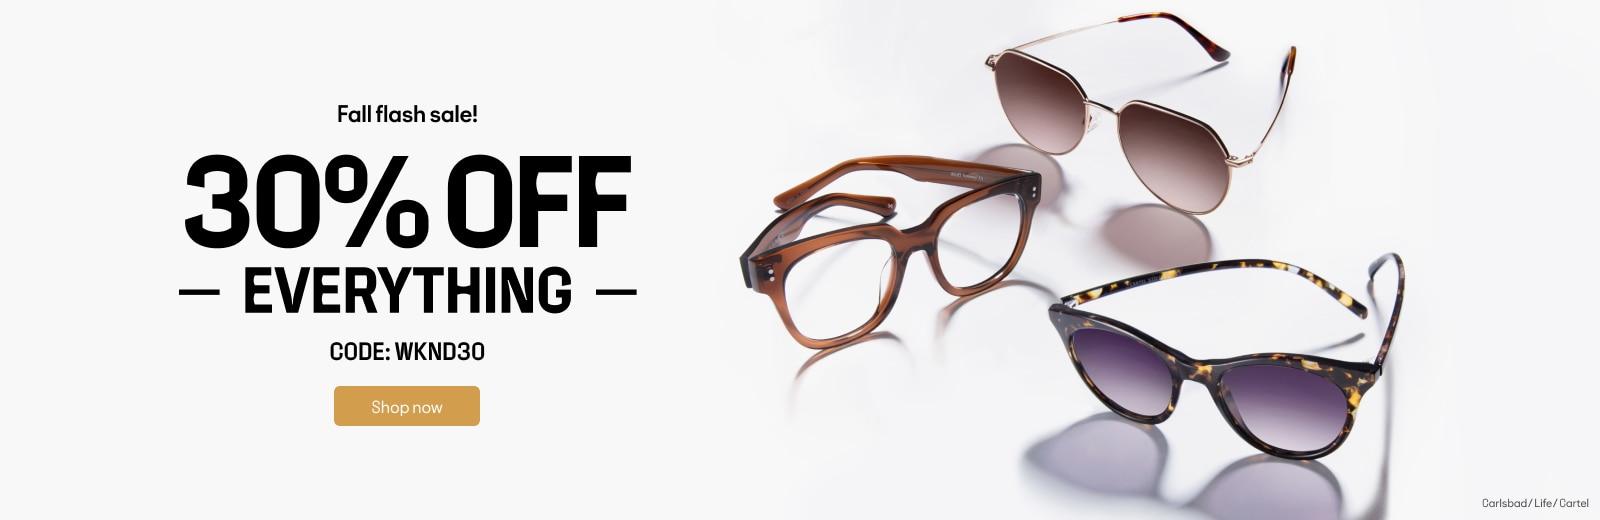 Fall flash sale!  30% OFF    Code: WKND30